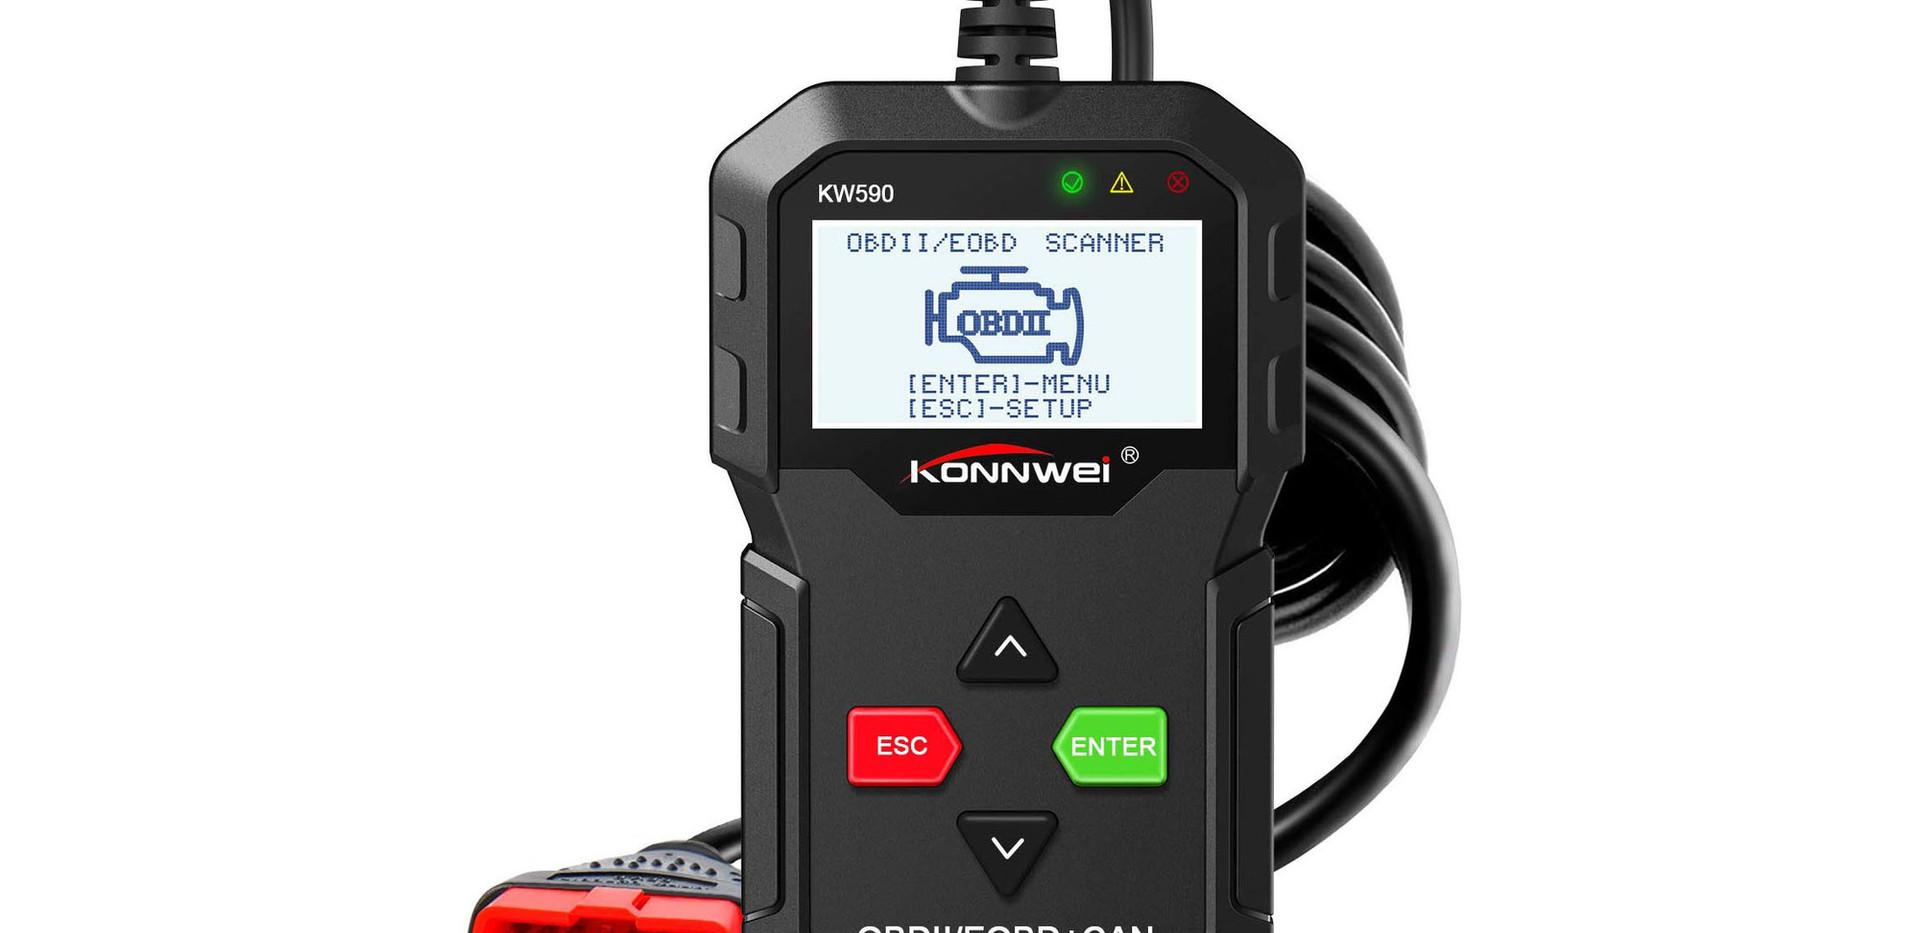 Konnwei KW590 OBD 2 Scanner   Auto Diagnose